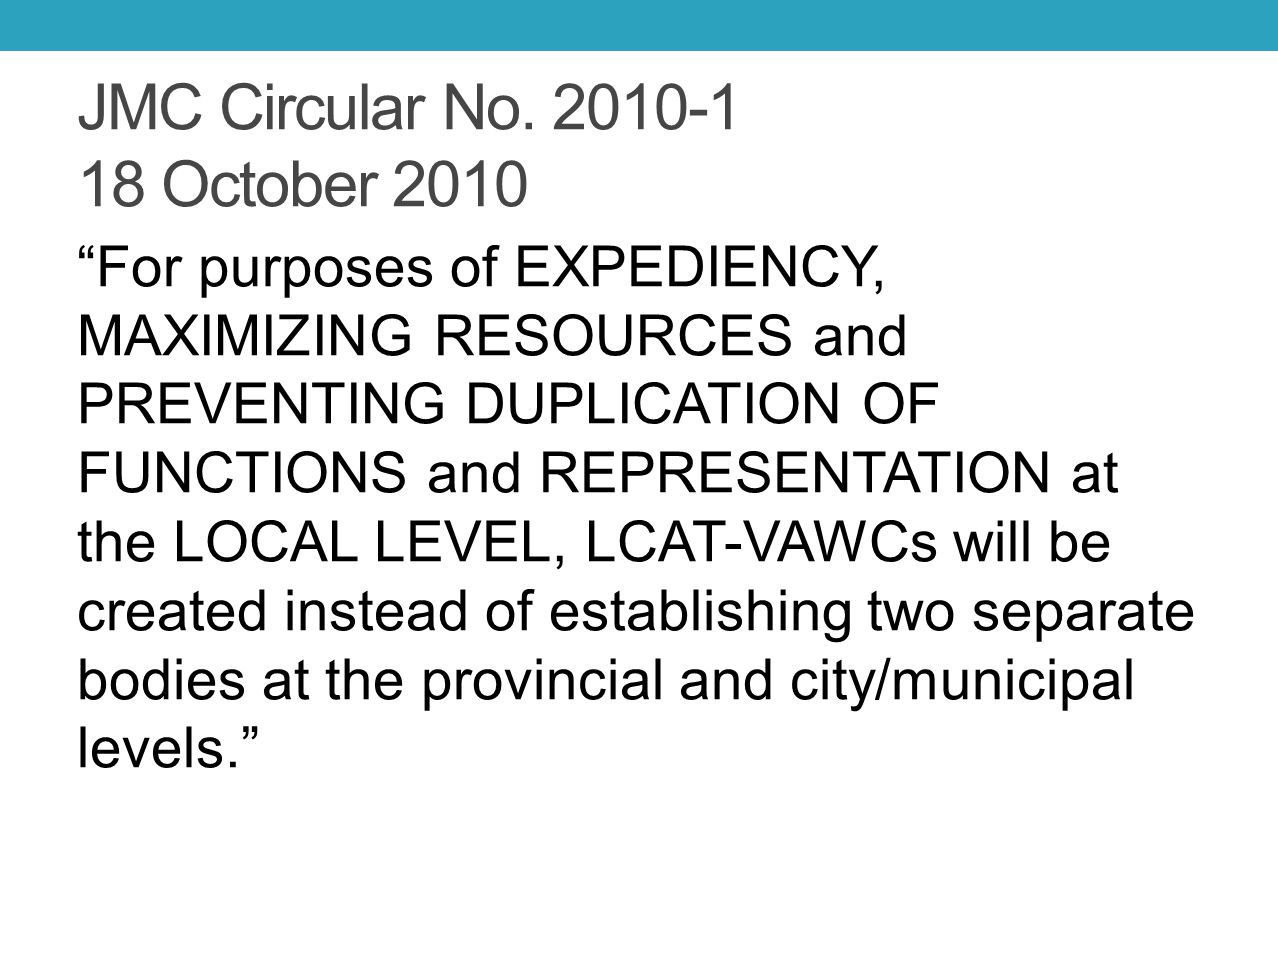 JMC Circular No. 2010-1 18 October 2010